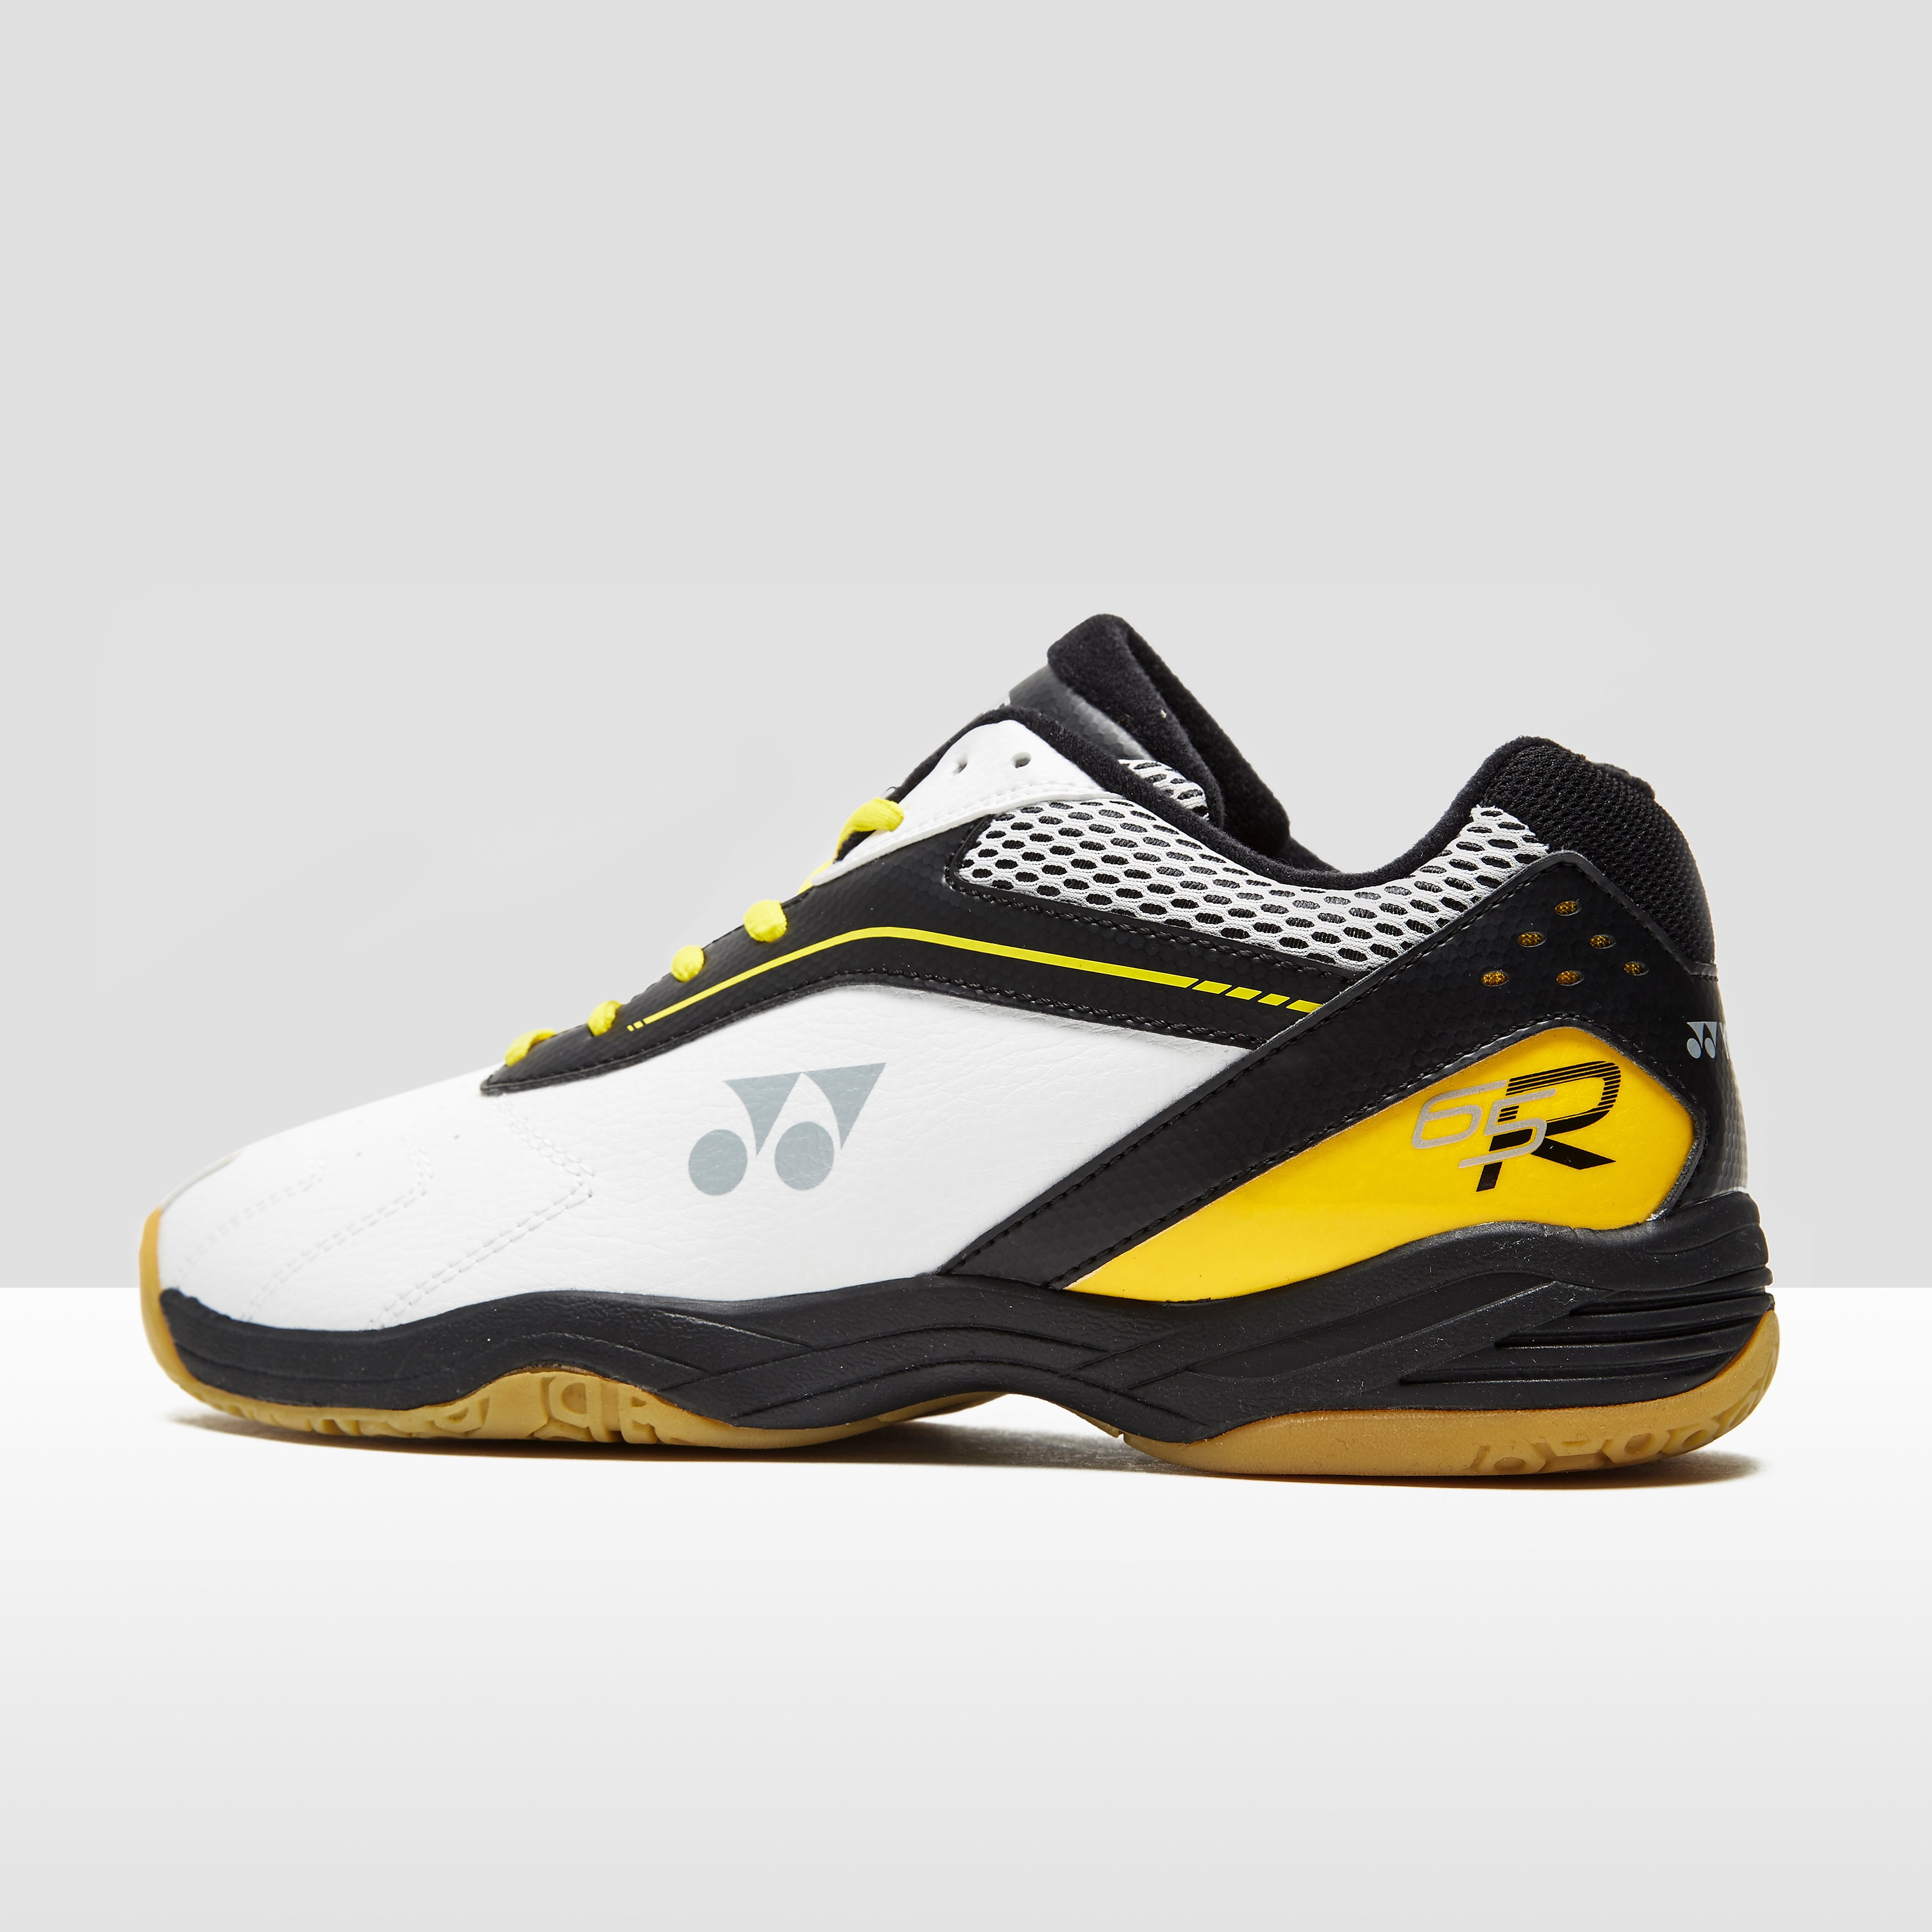 Yonex Power Cushion 65 REX Men's Badminton Shoes